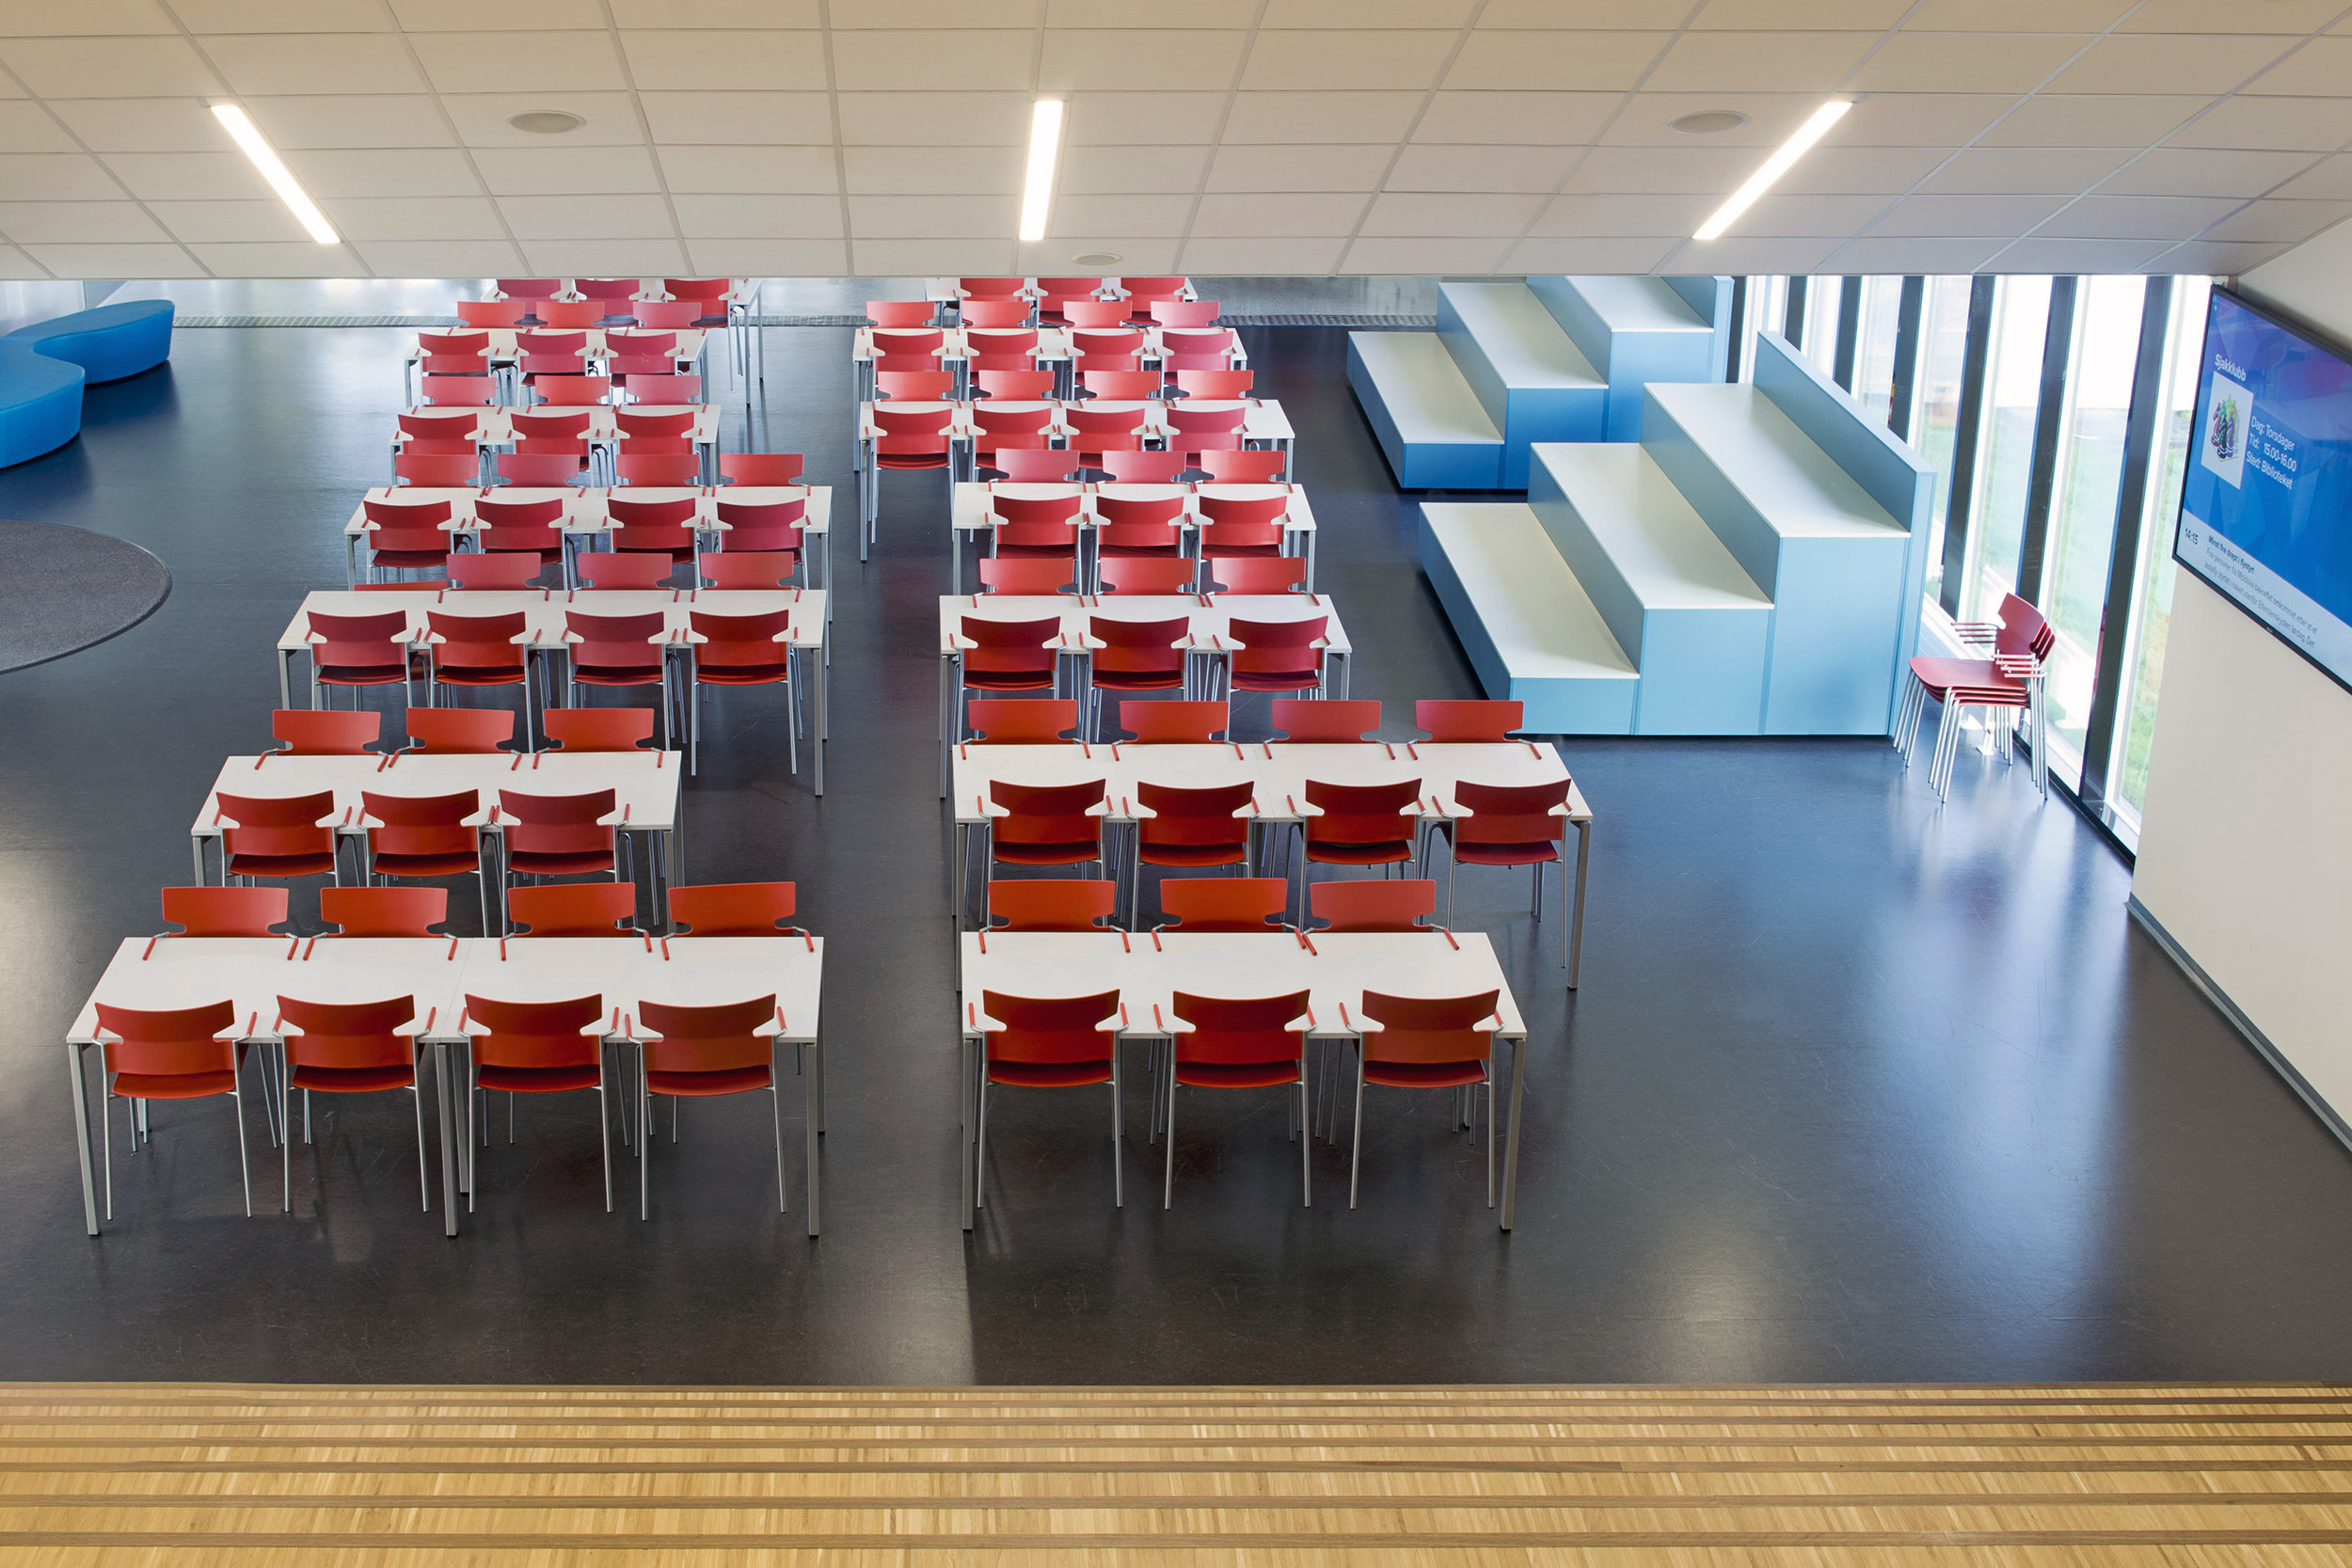 Ramstad skole_Amfi 01.jpg